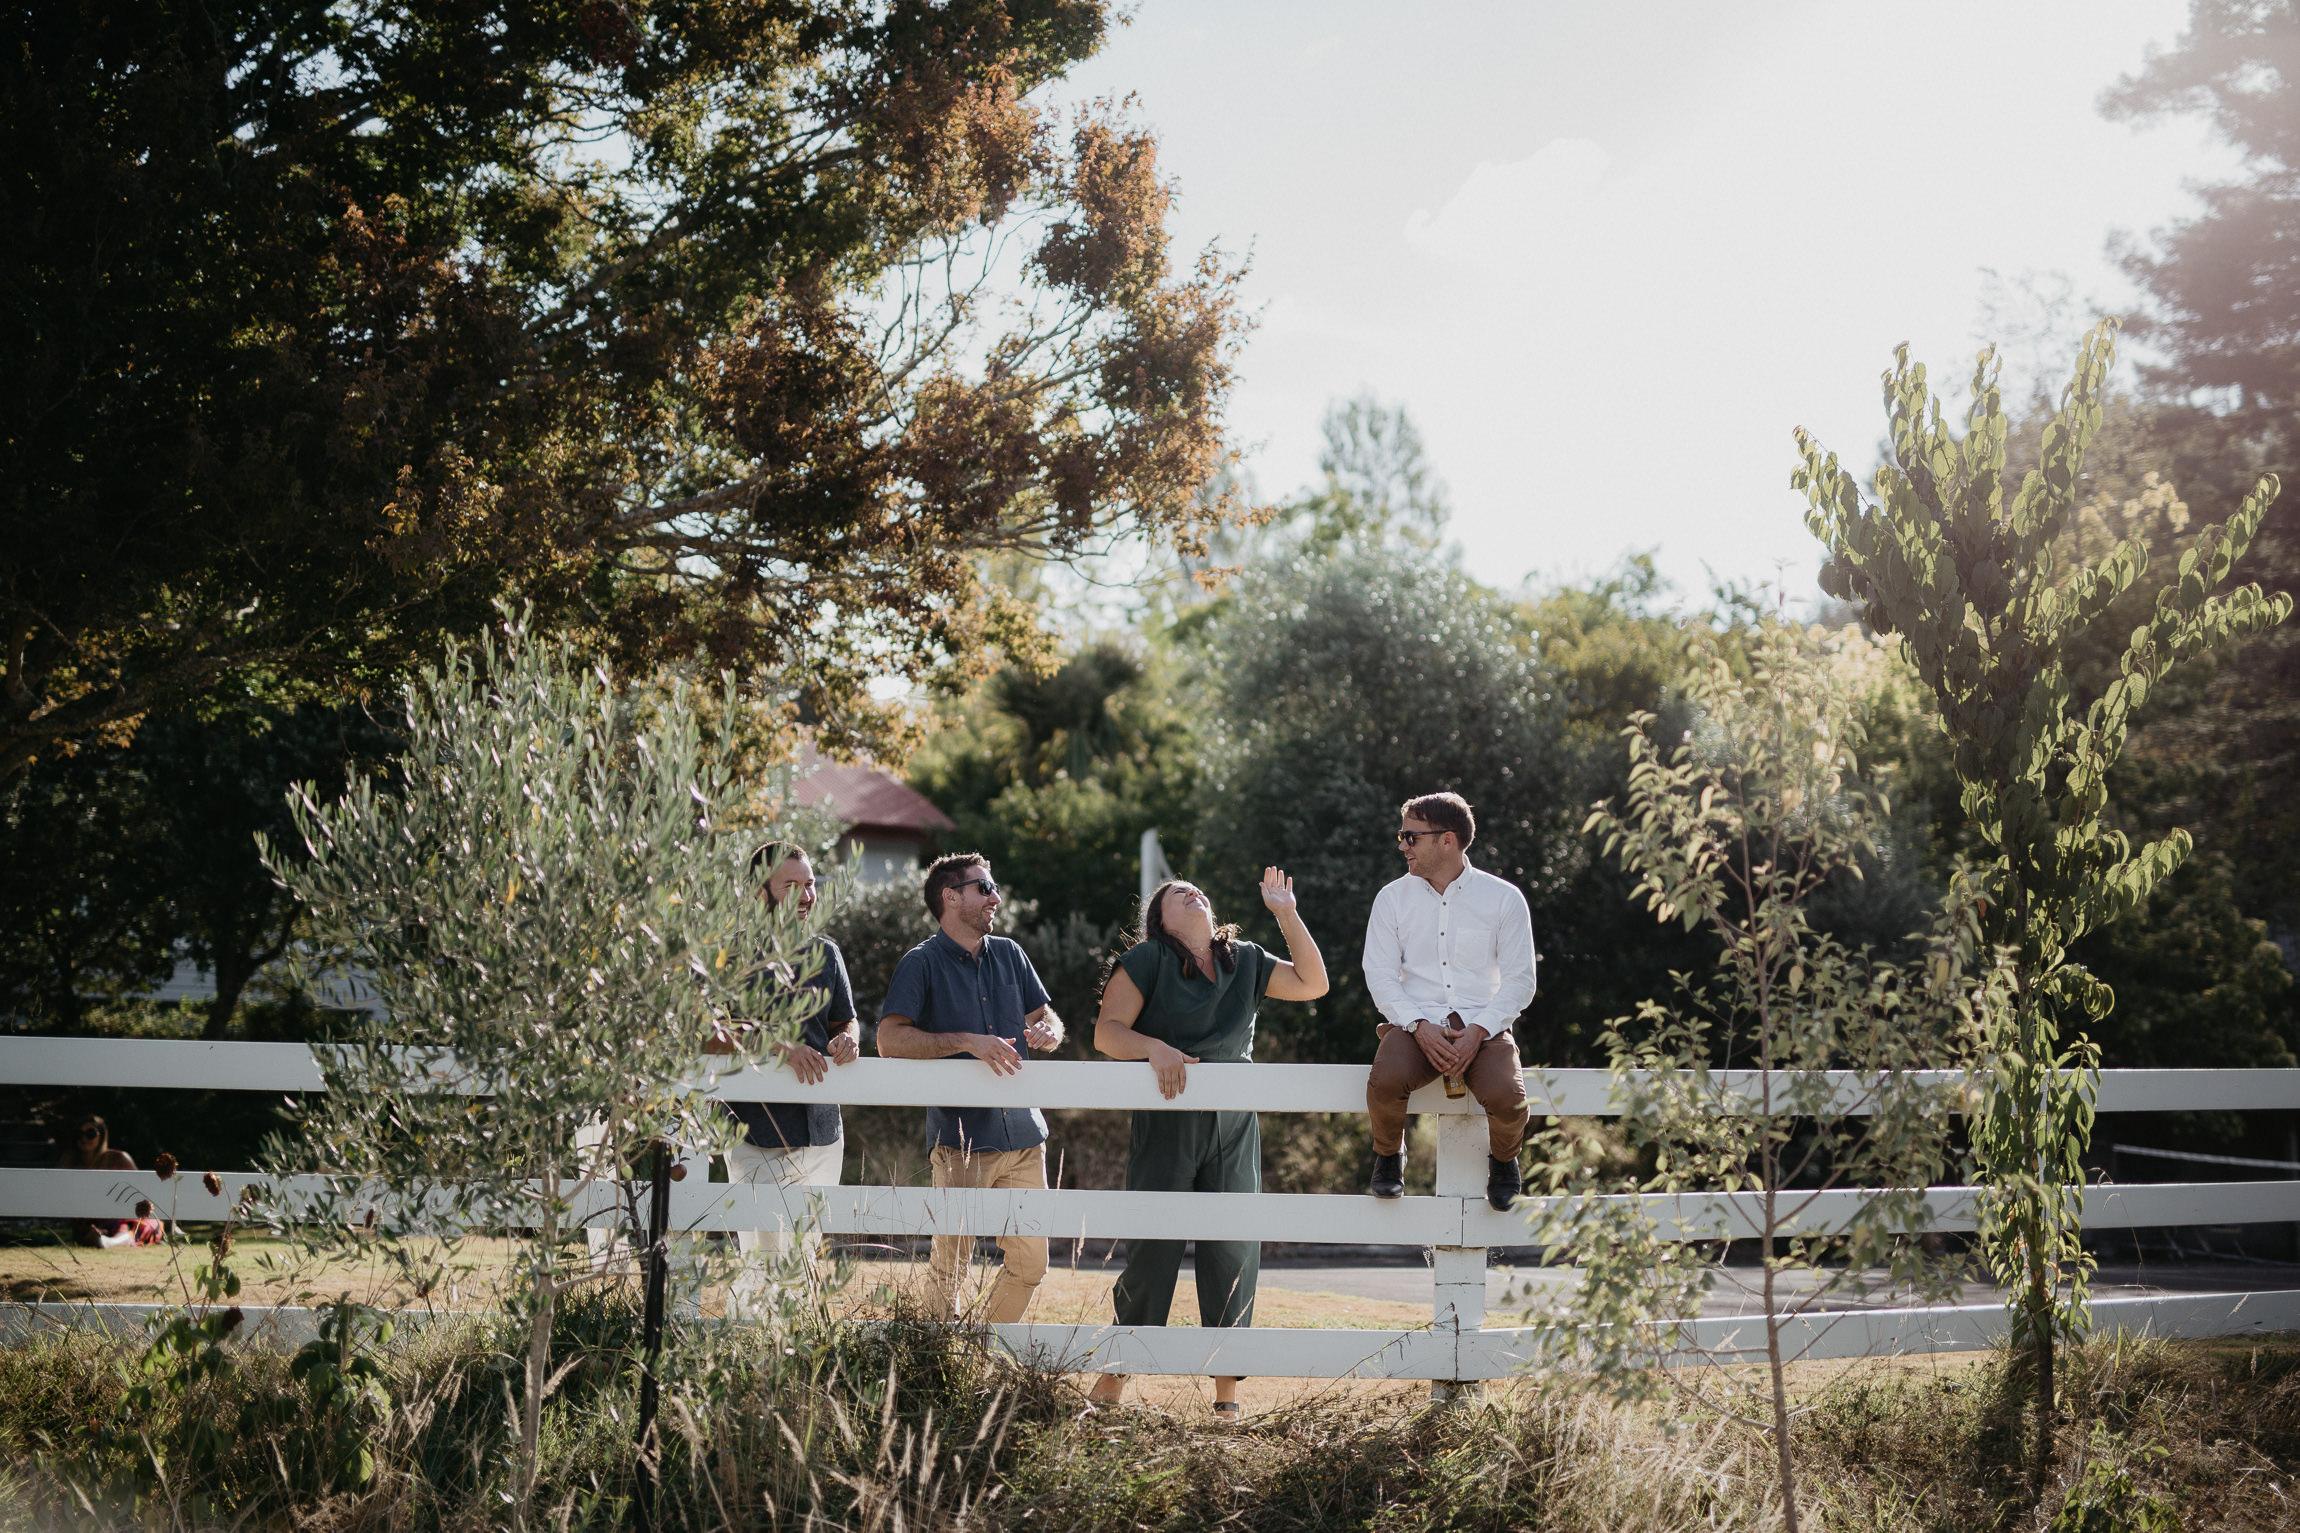 oldforestschool-wedding-blog-143.jpg